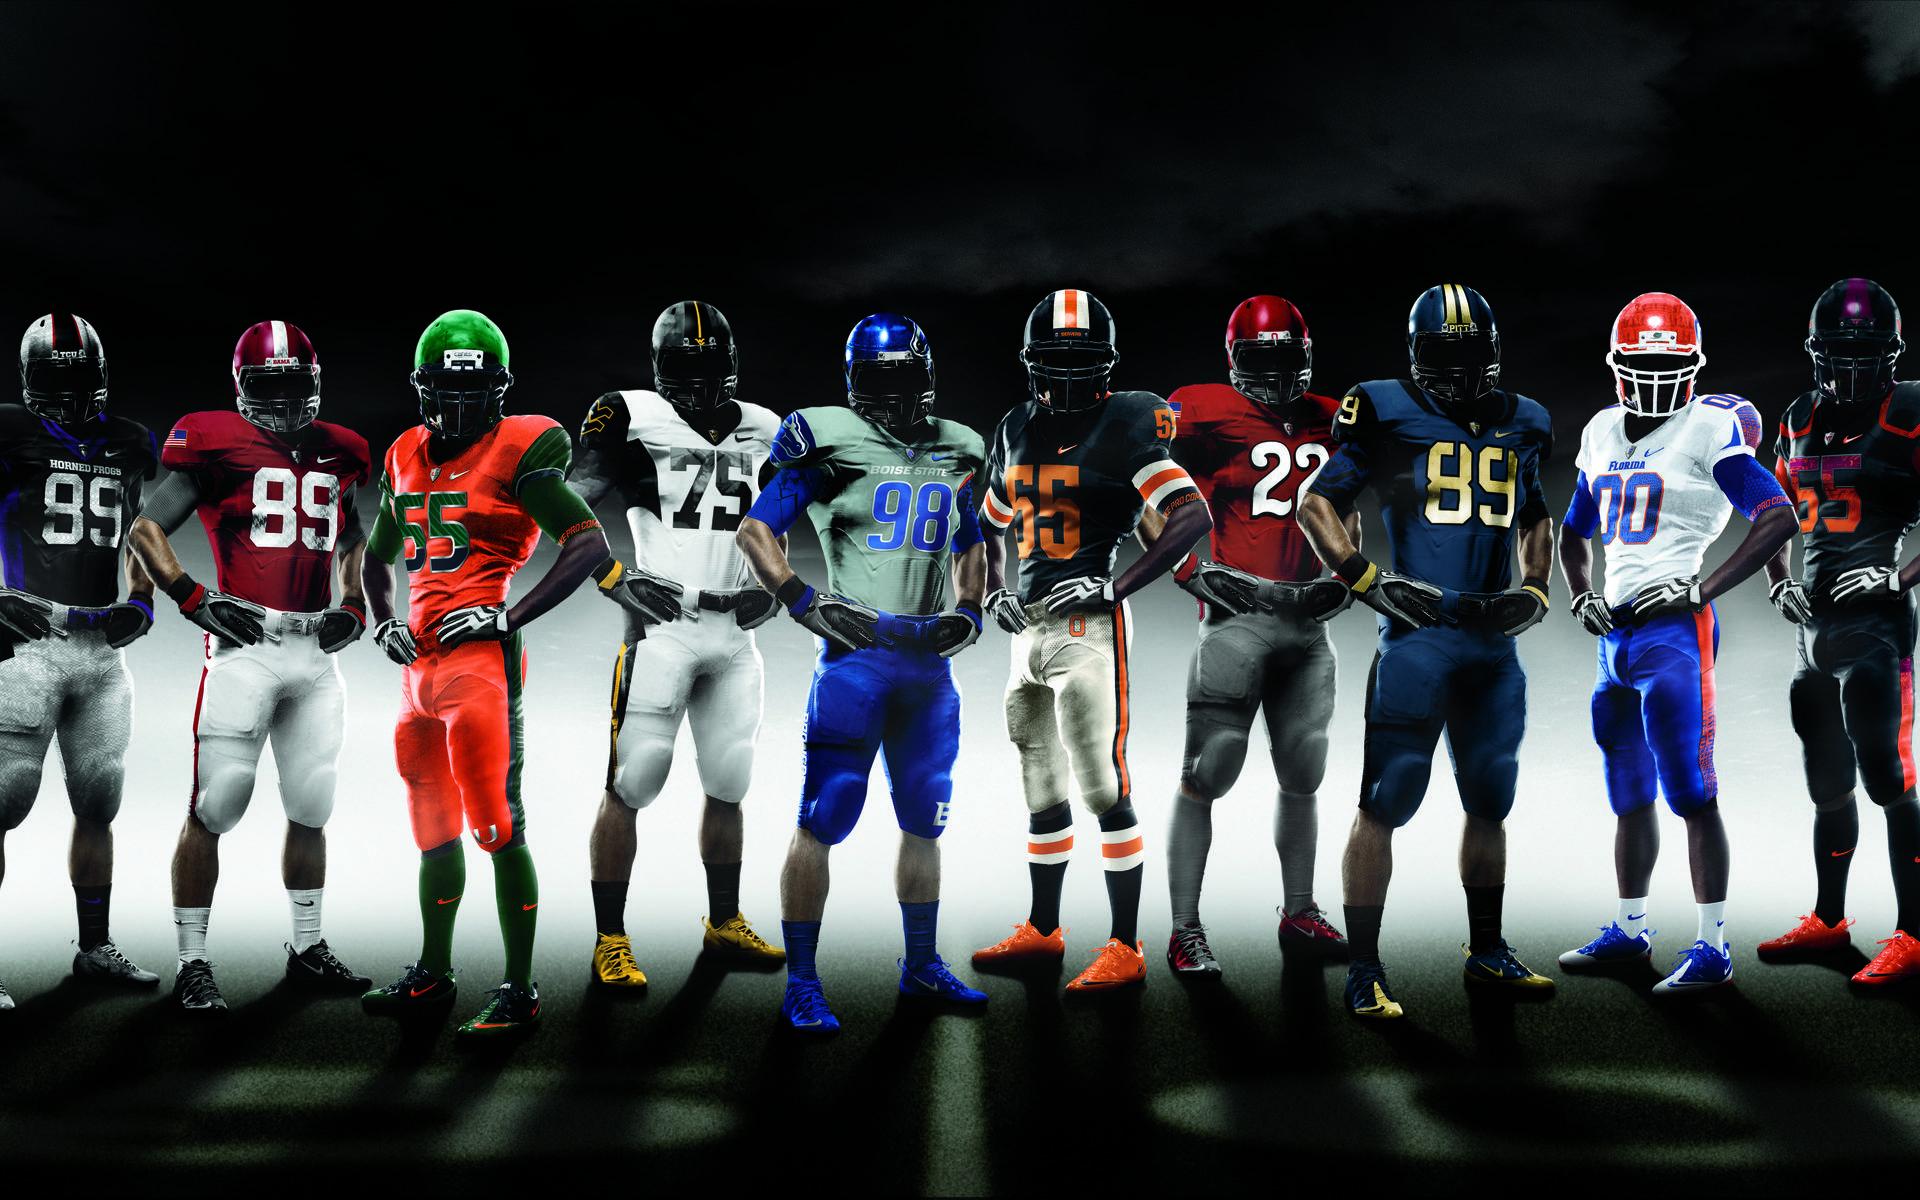 Football Desktop Wallpapers - Wallpaper Cave